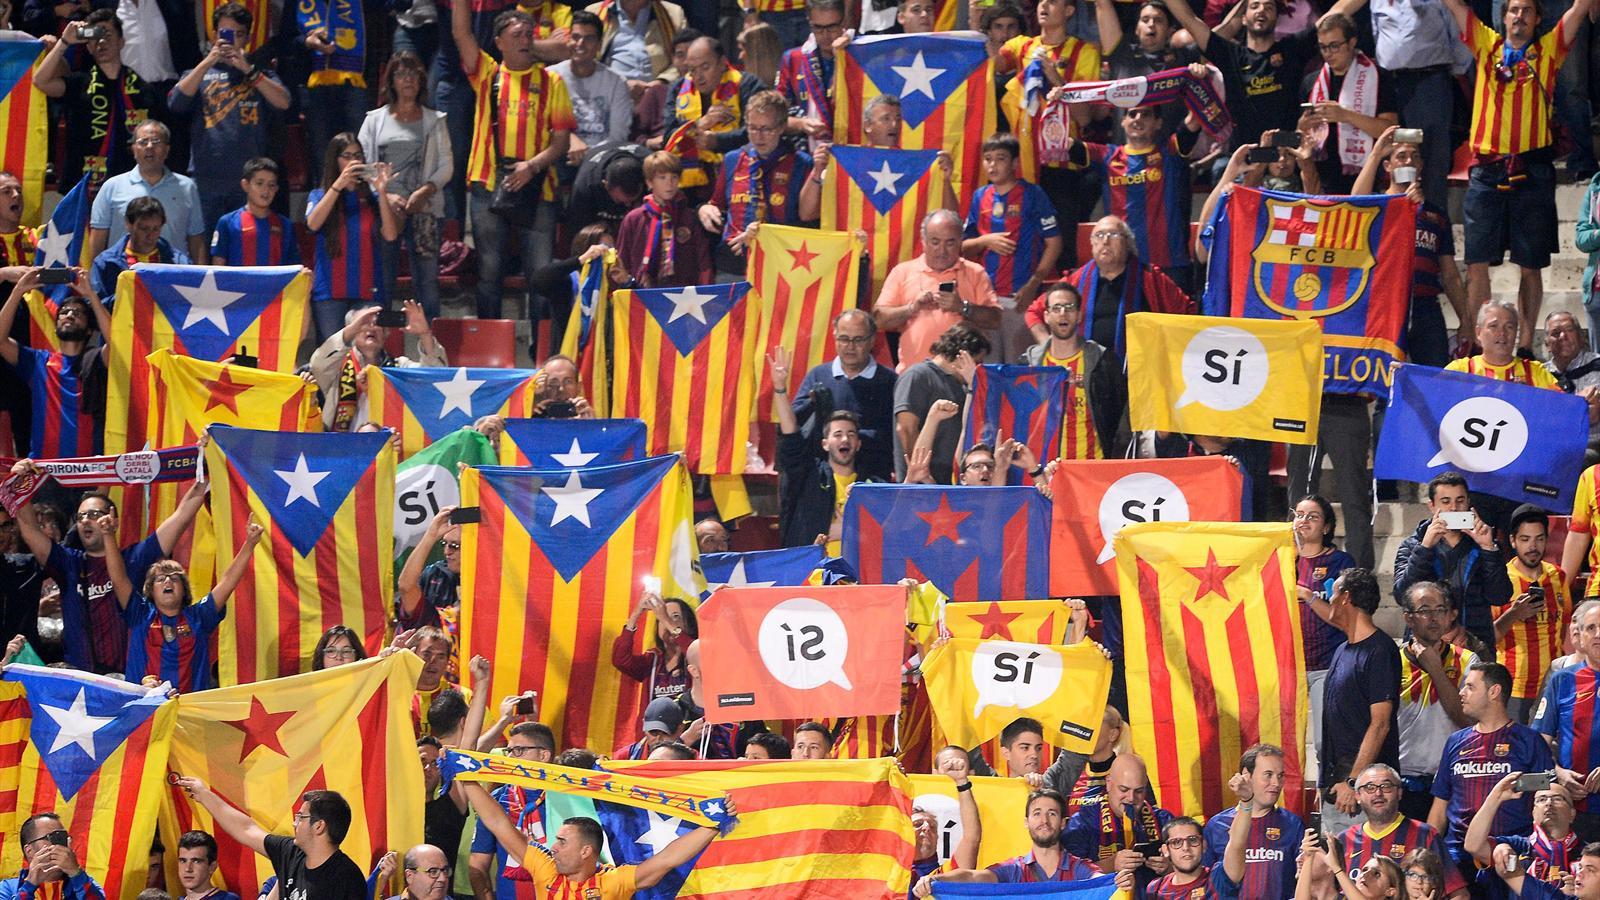 Sans la catalogne le sport espagnol serait radicalement transform omnisport eurosport - Coupe de la liga espagnol ...